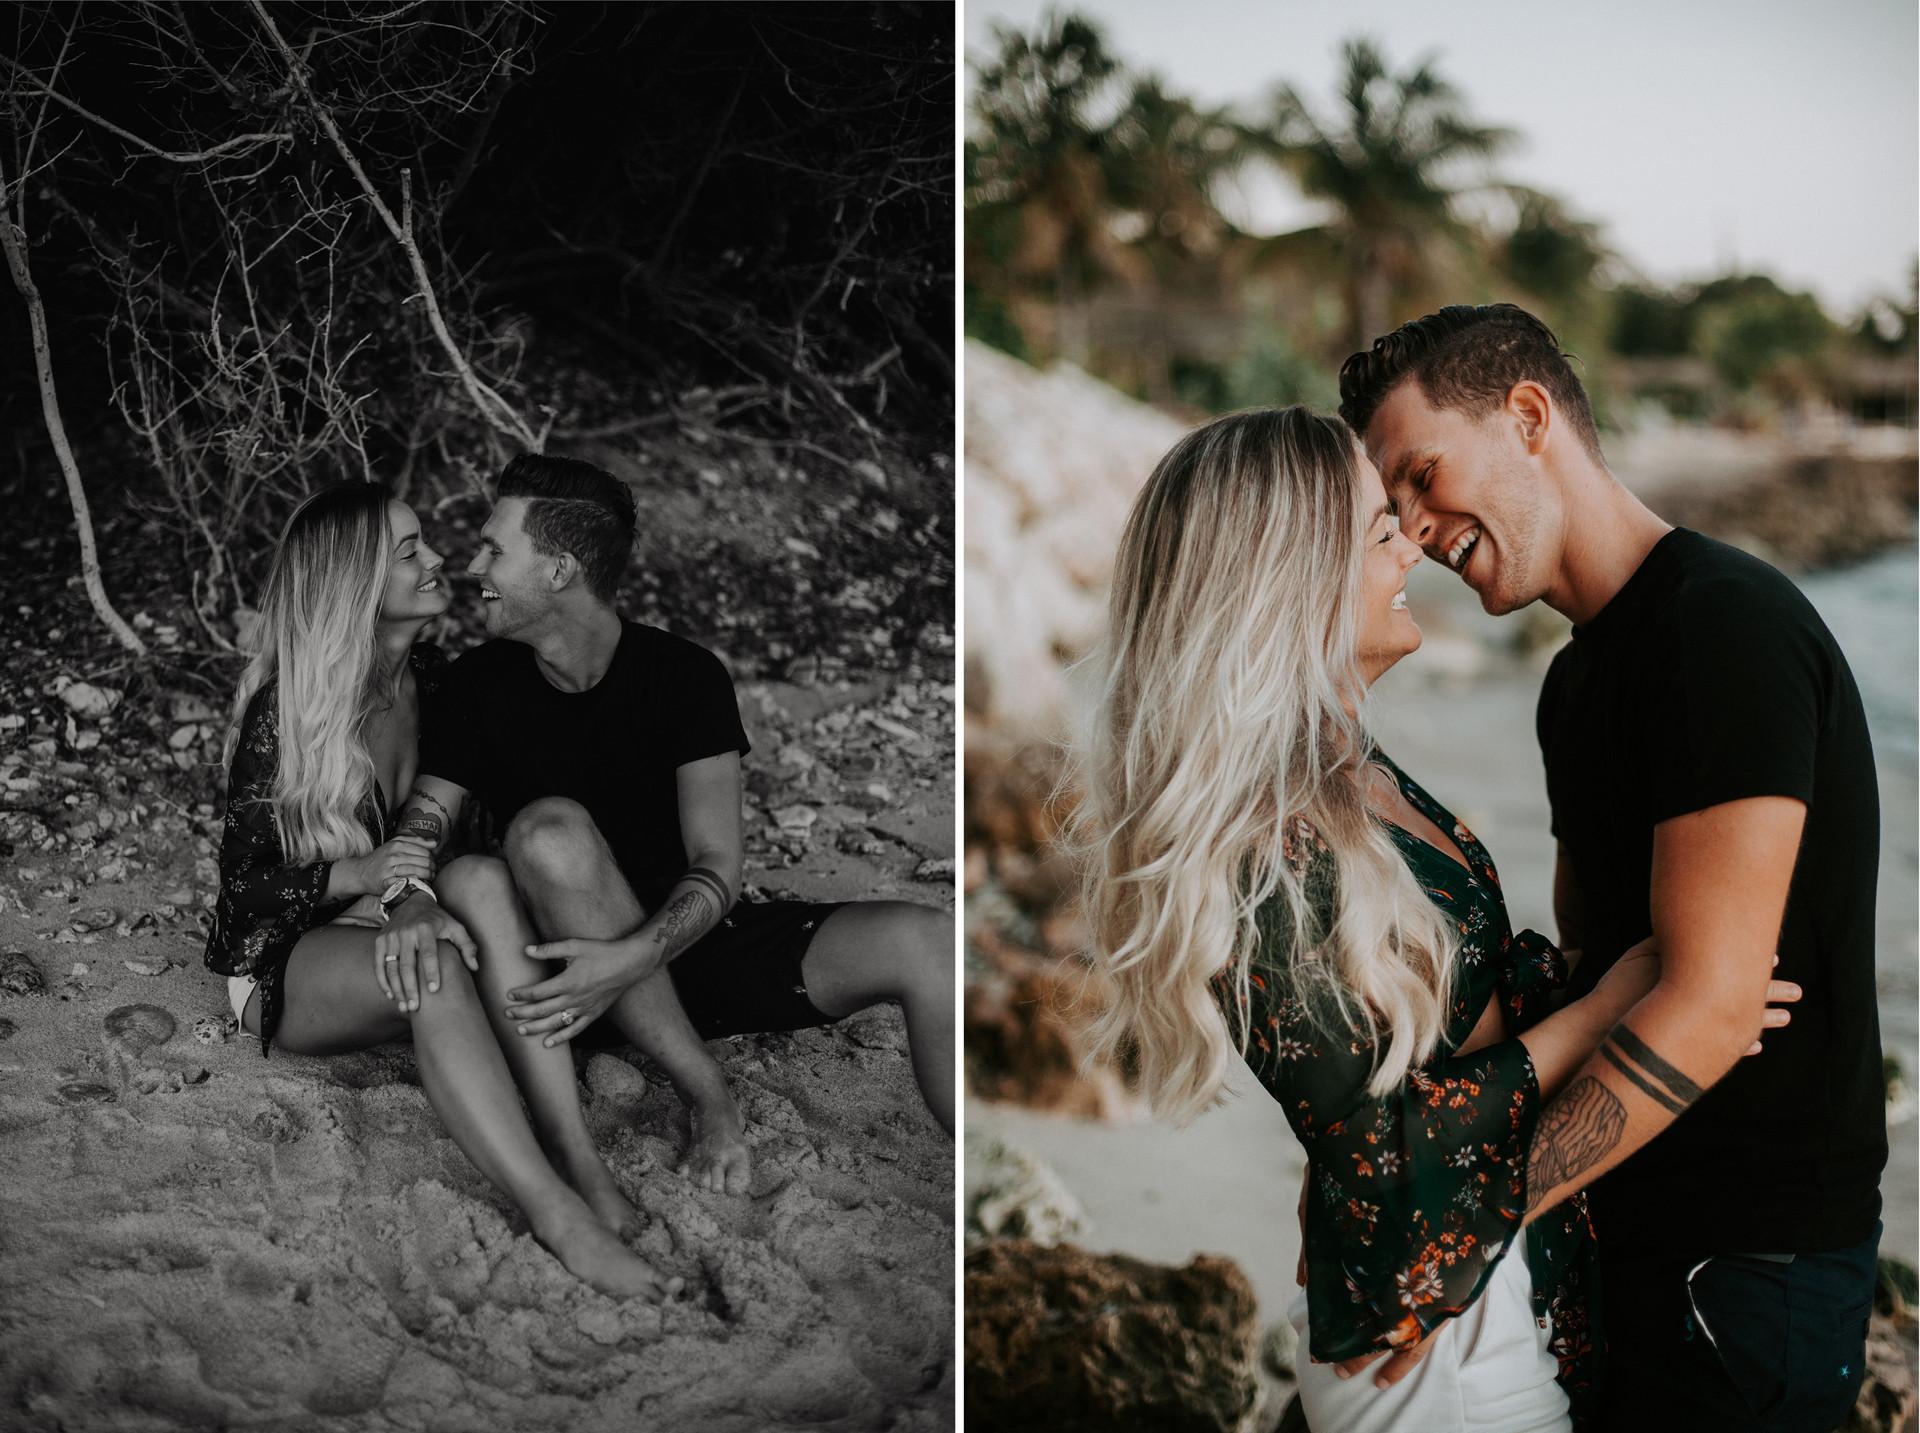 Loveshoot - trouwfotografie - Stance Photography